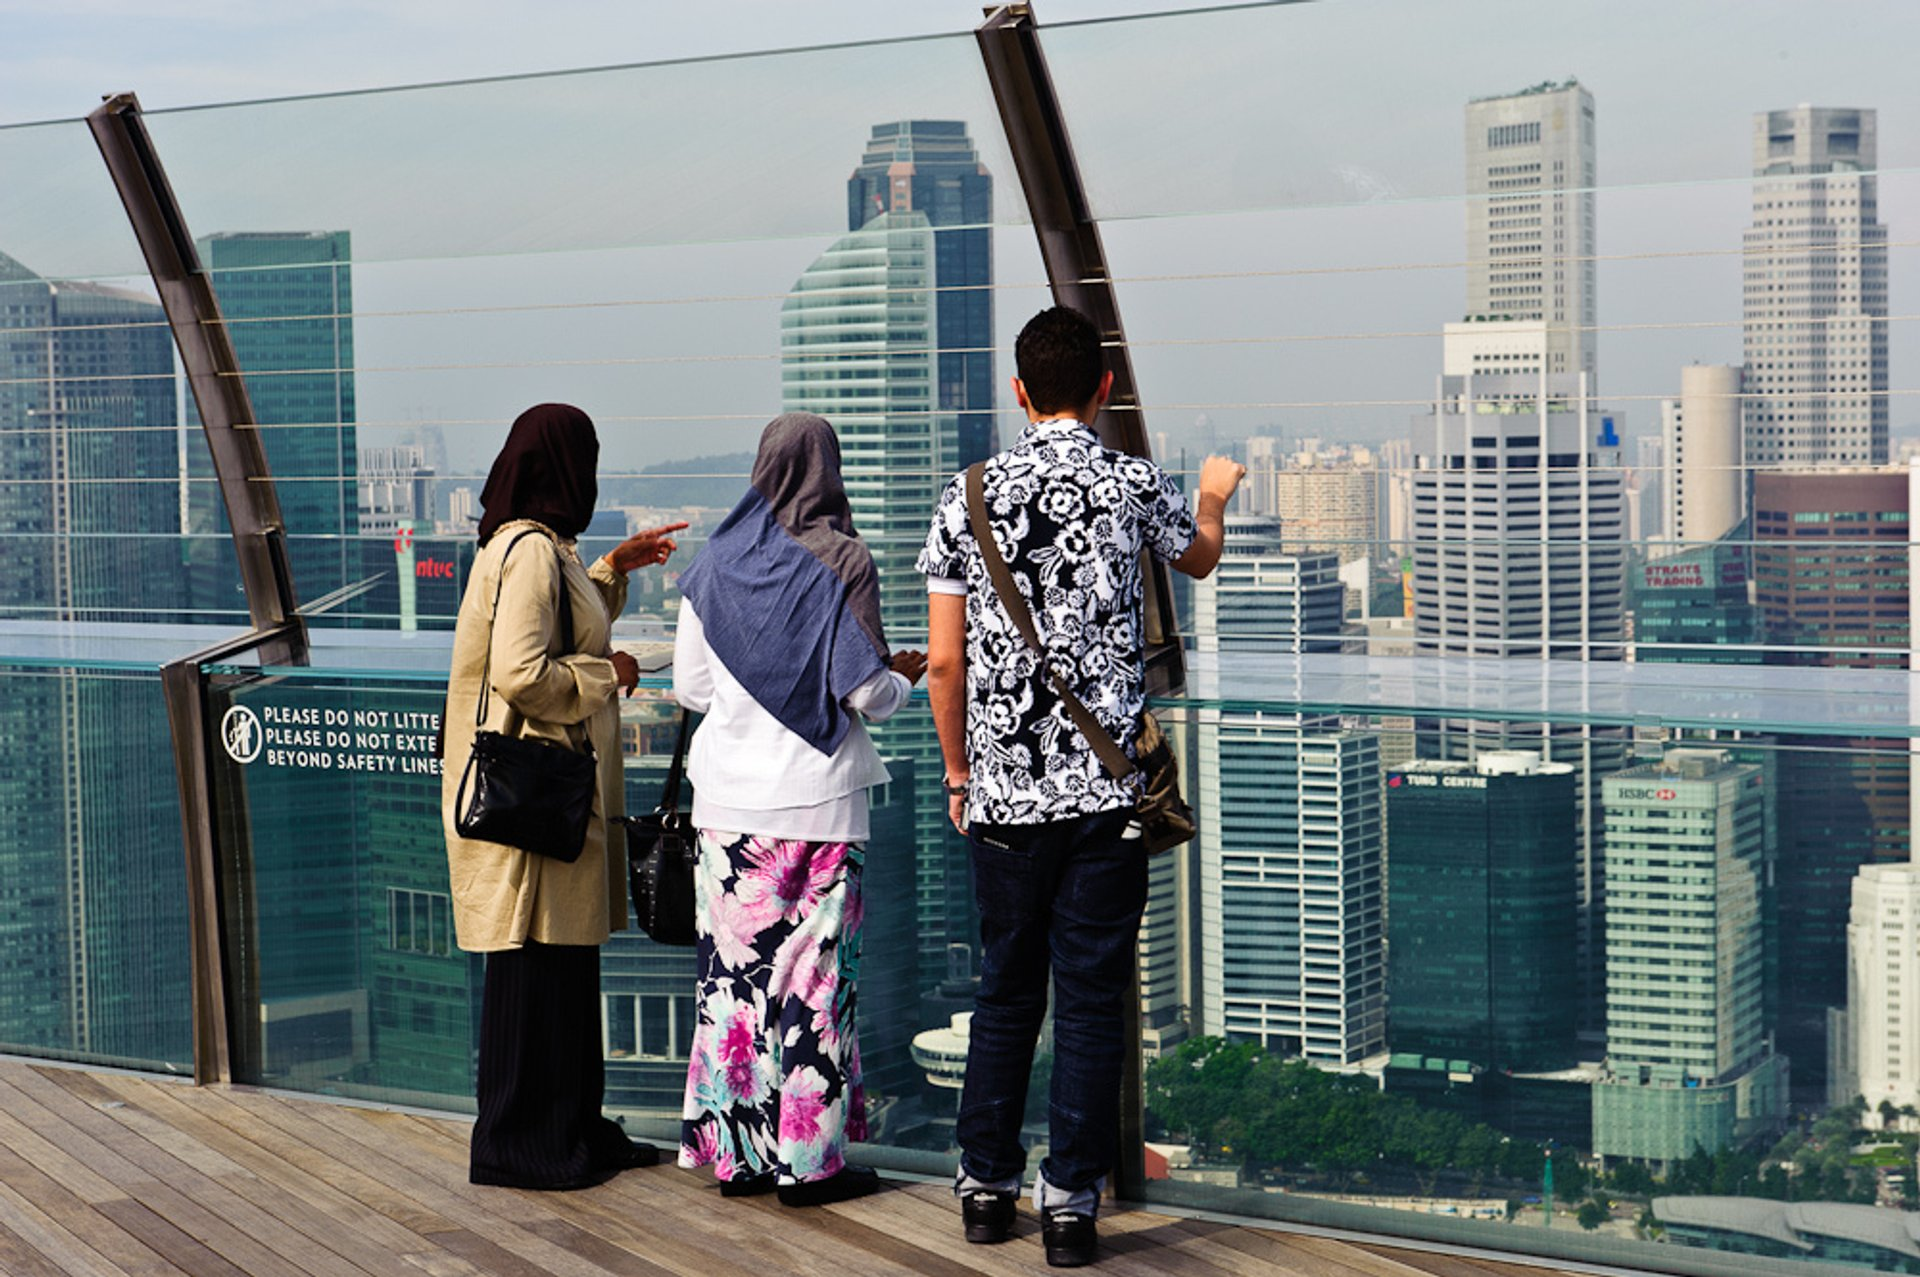 Best time for Marina Bay Sands SkyPark